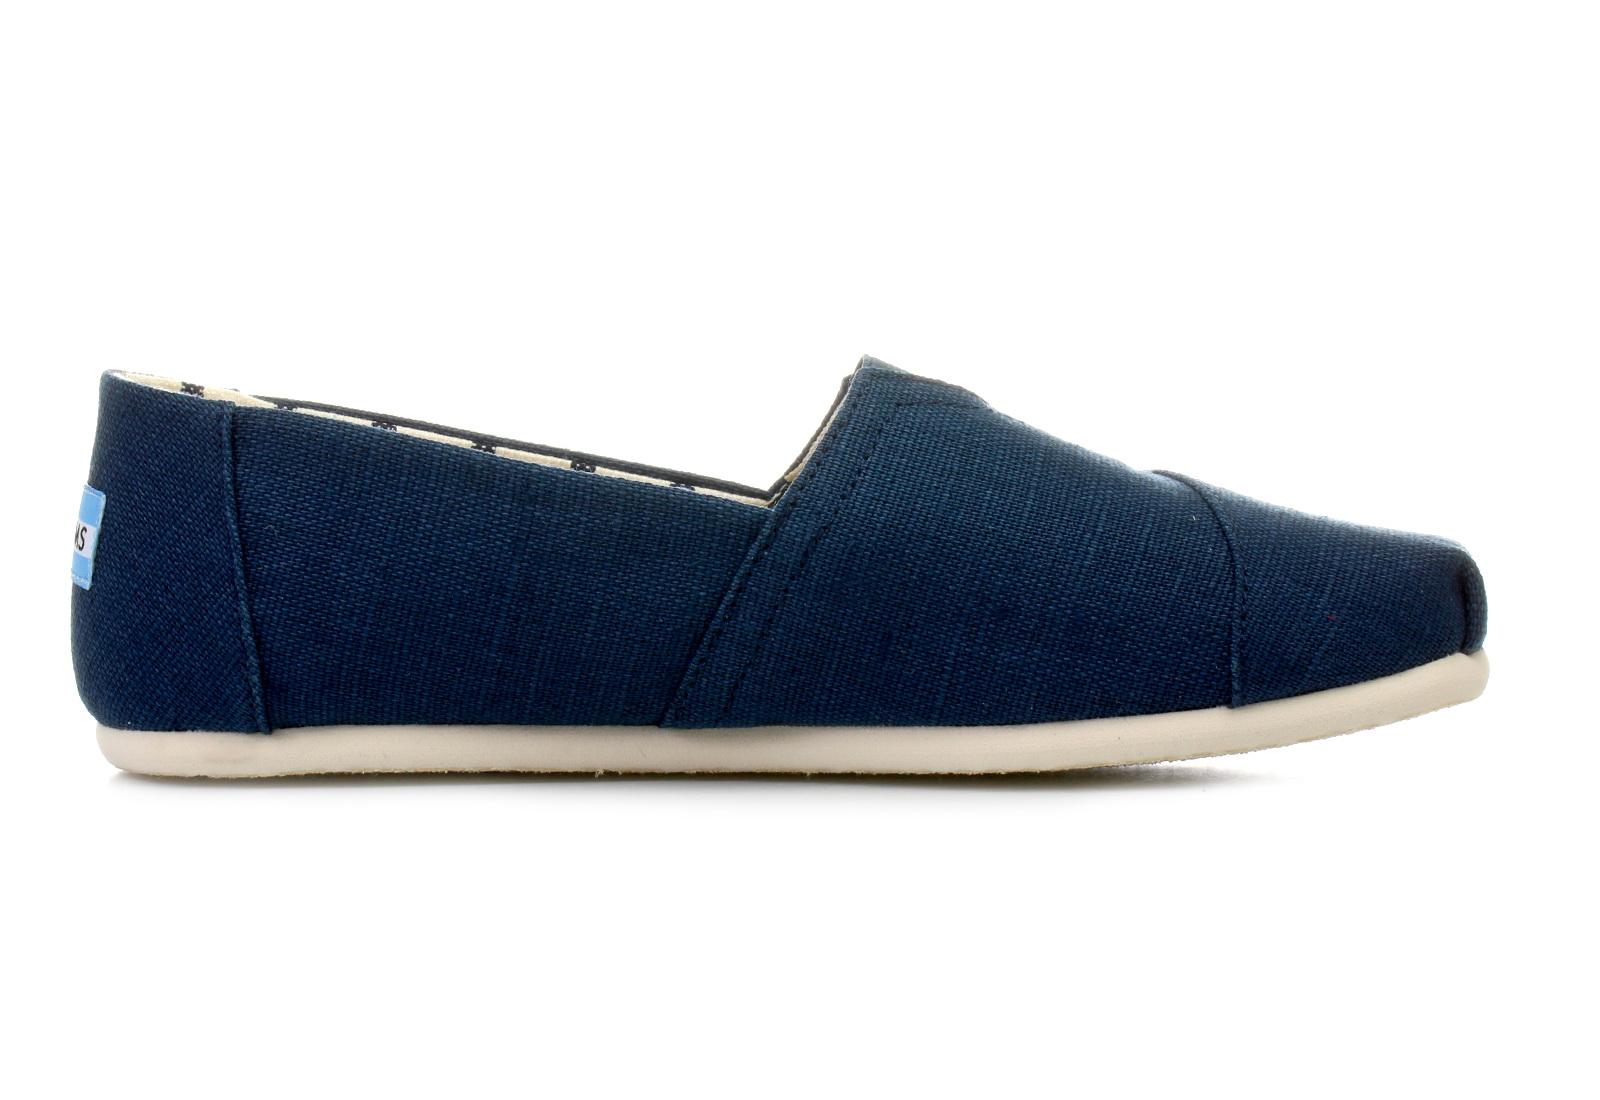 477be298060 Toms Shoes - Alpargata - 10011704-blu - Online shop for sneakers ...